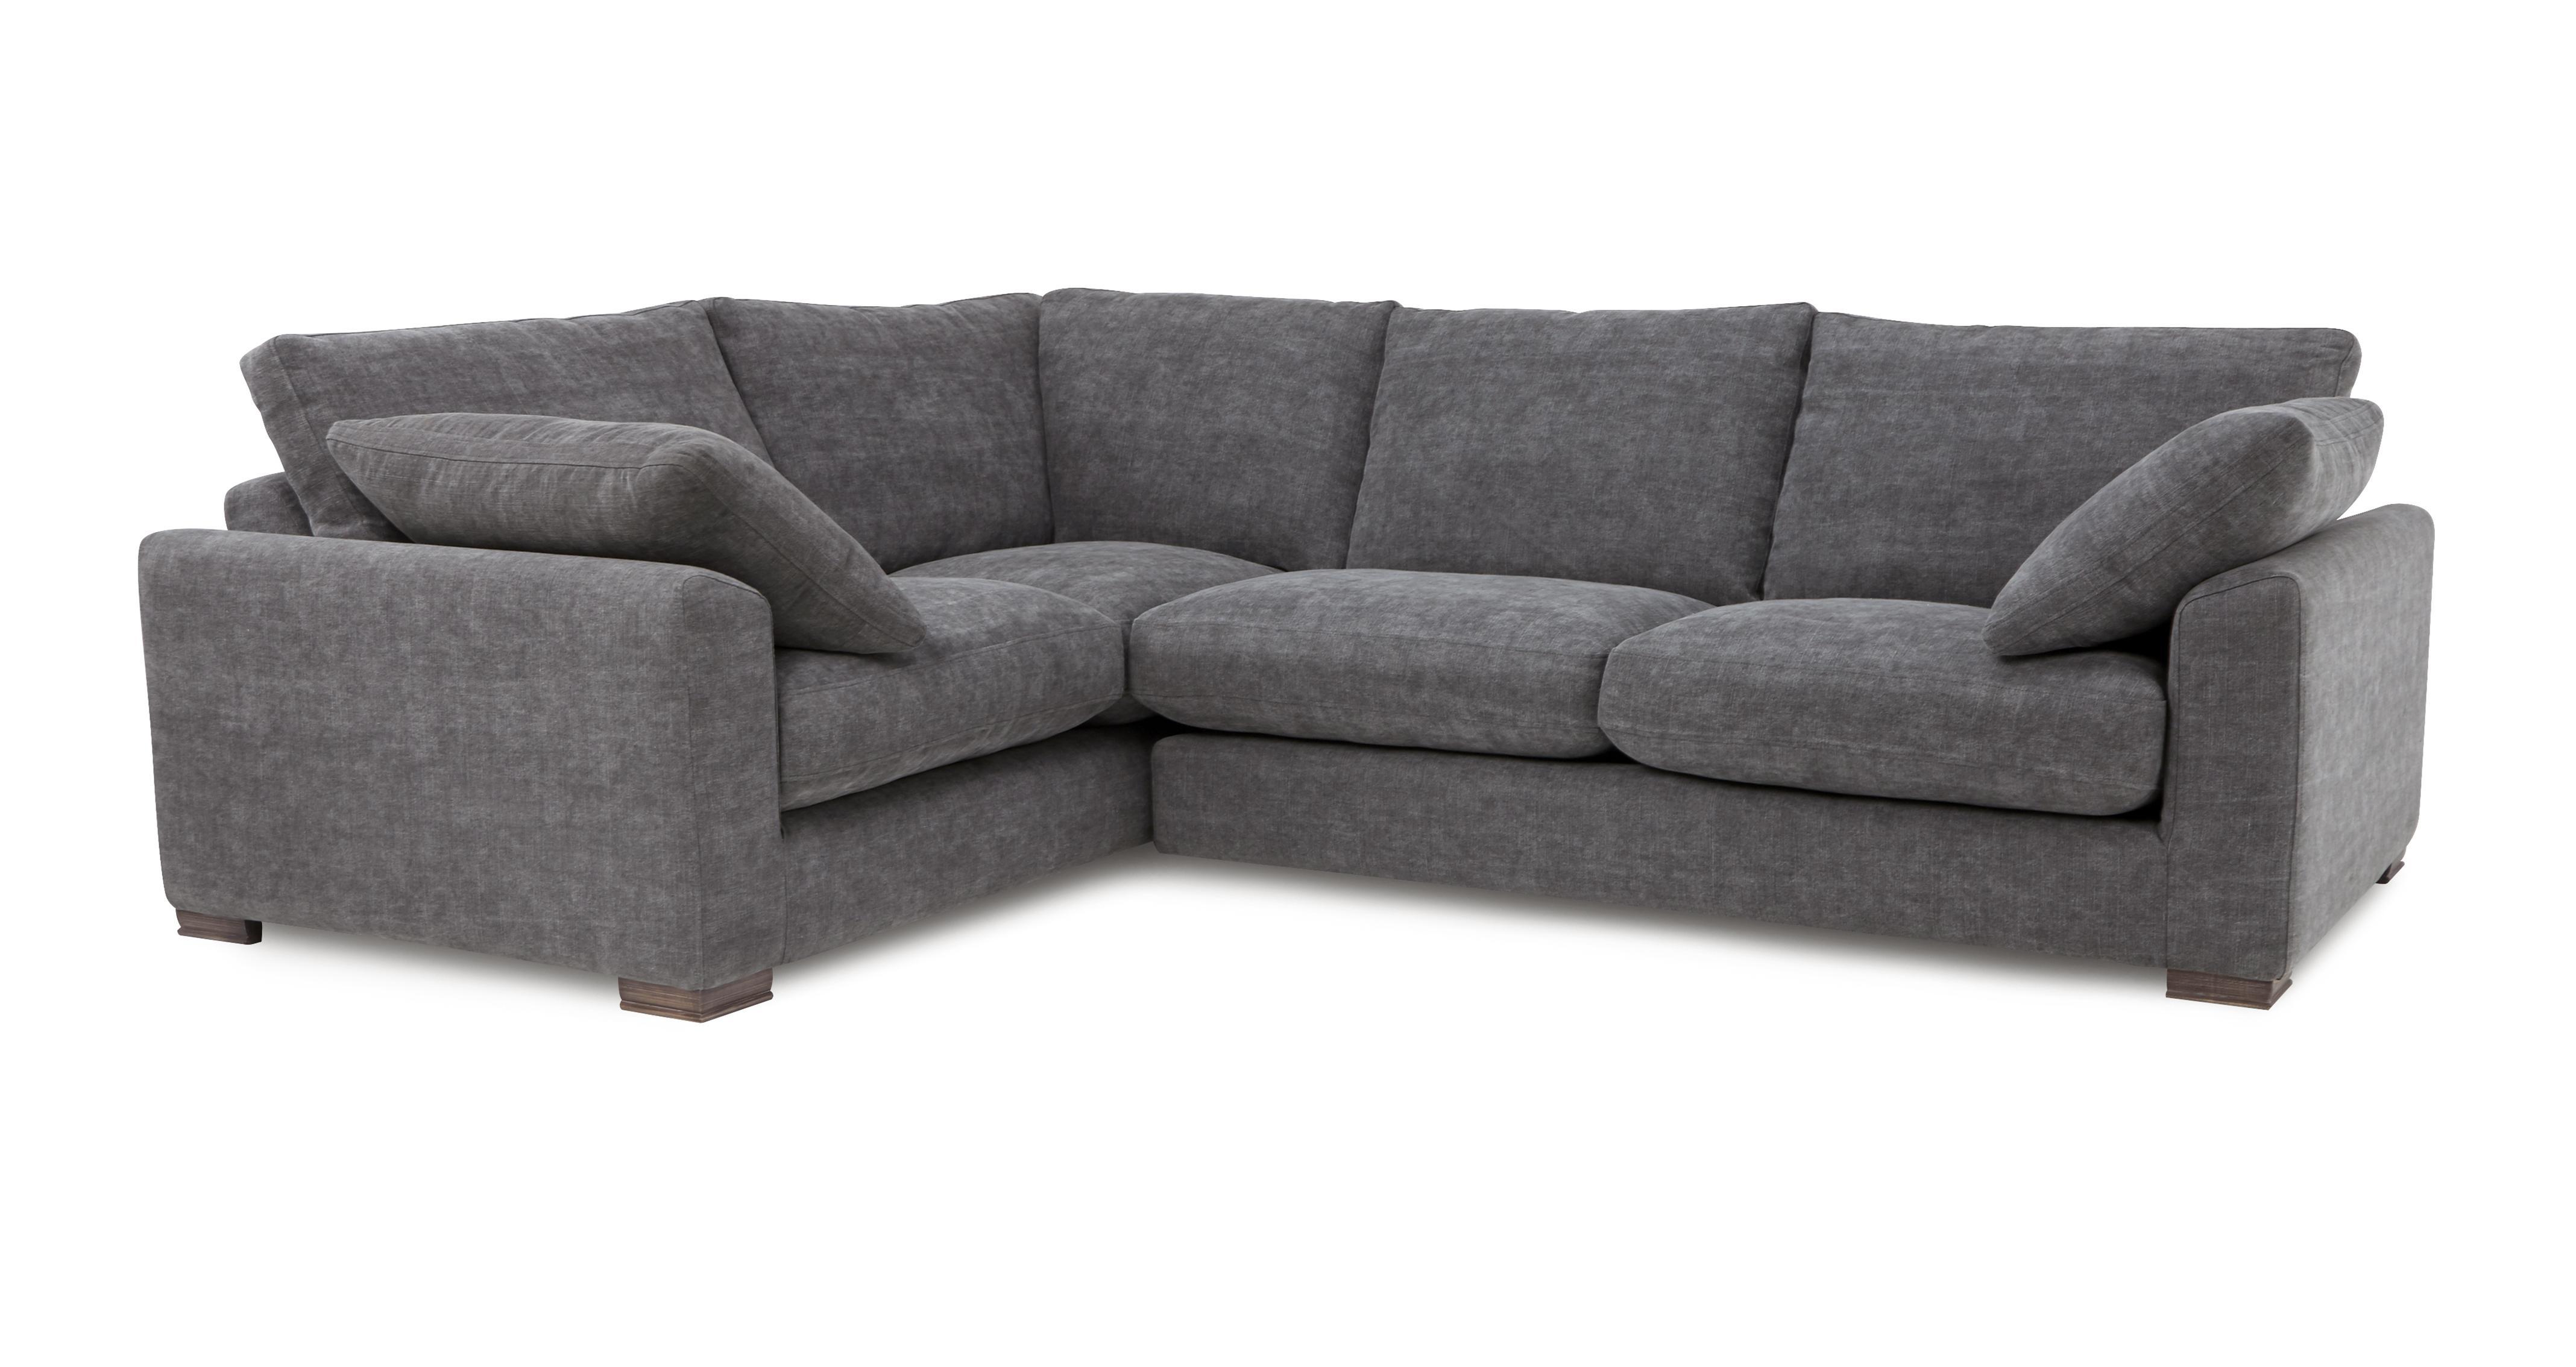 Incredible Dfs Sale Sofas Limerick Lumina 3 Seater Leather Sofa From Inzonedesignstudio Interior Chair Design Inzonedesignstudiocom